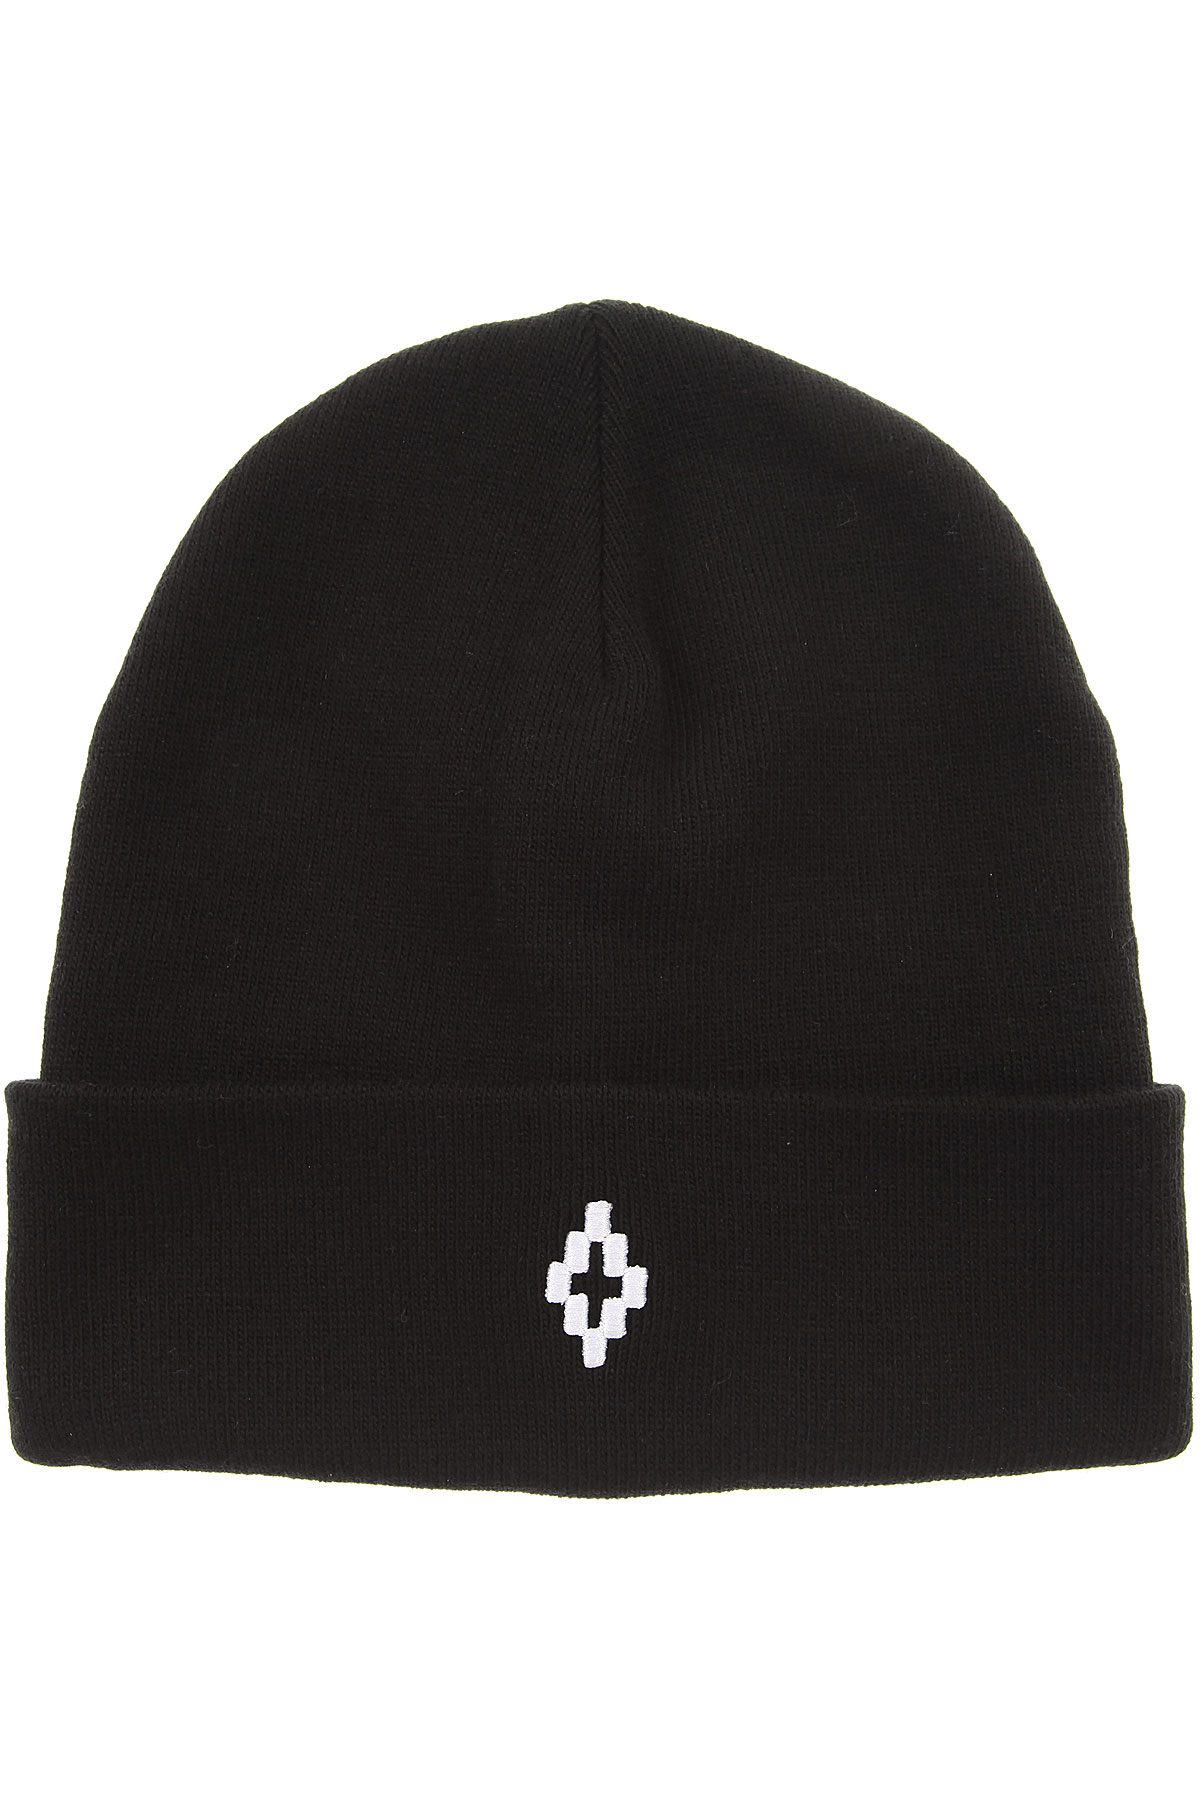 Image of Marcelo Burlon Hat for Women, Black, Acrylic, 2017